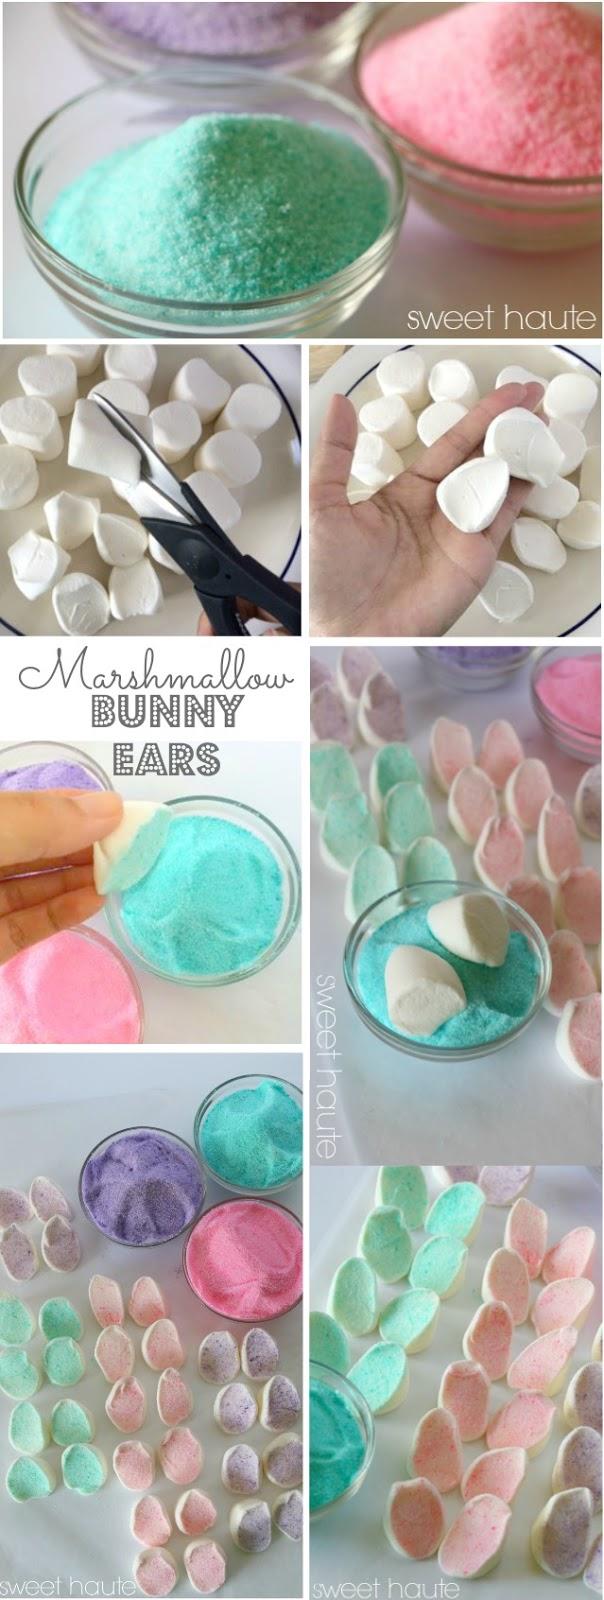 http://sweethaute.blogspot.com/2015/04/spring-marshmallow-bunny-ears.html